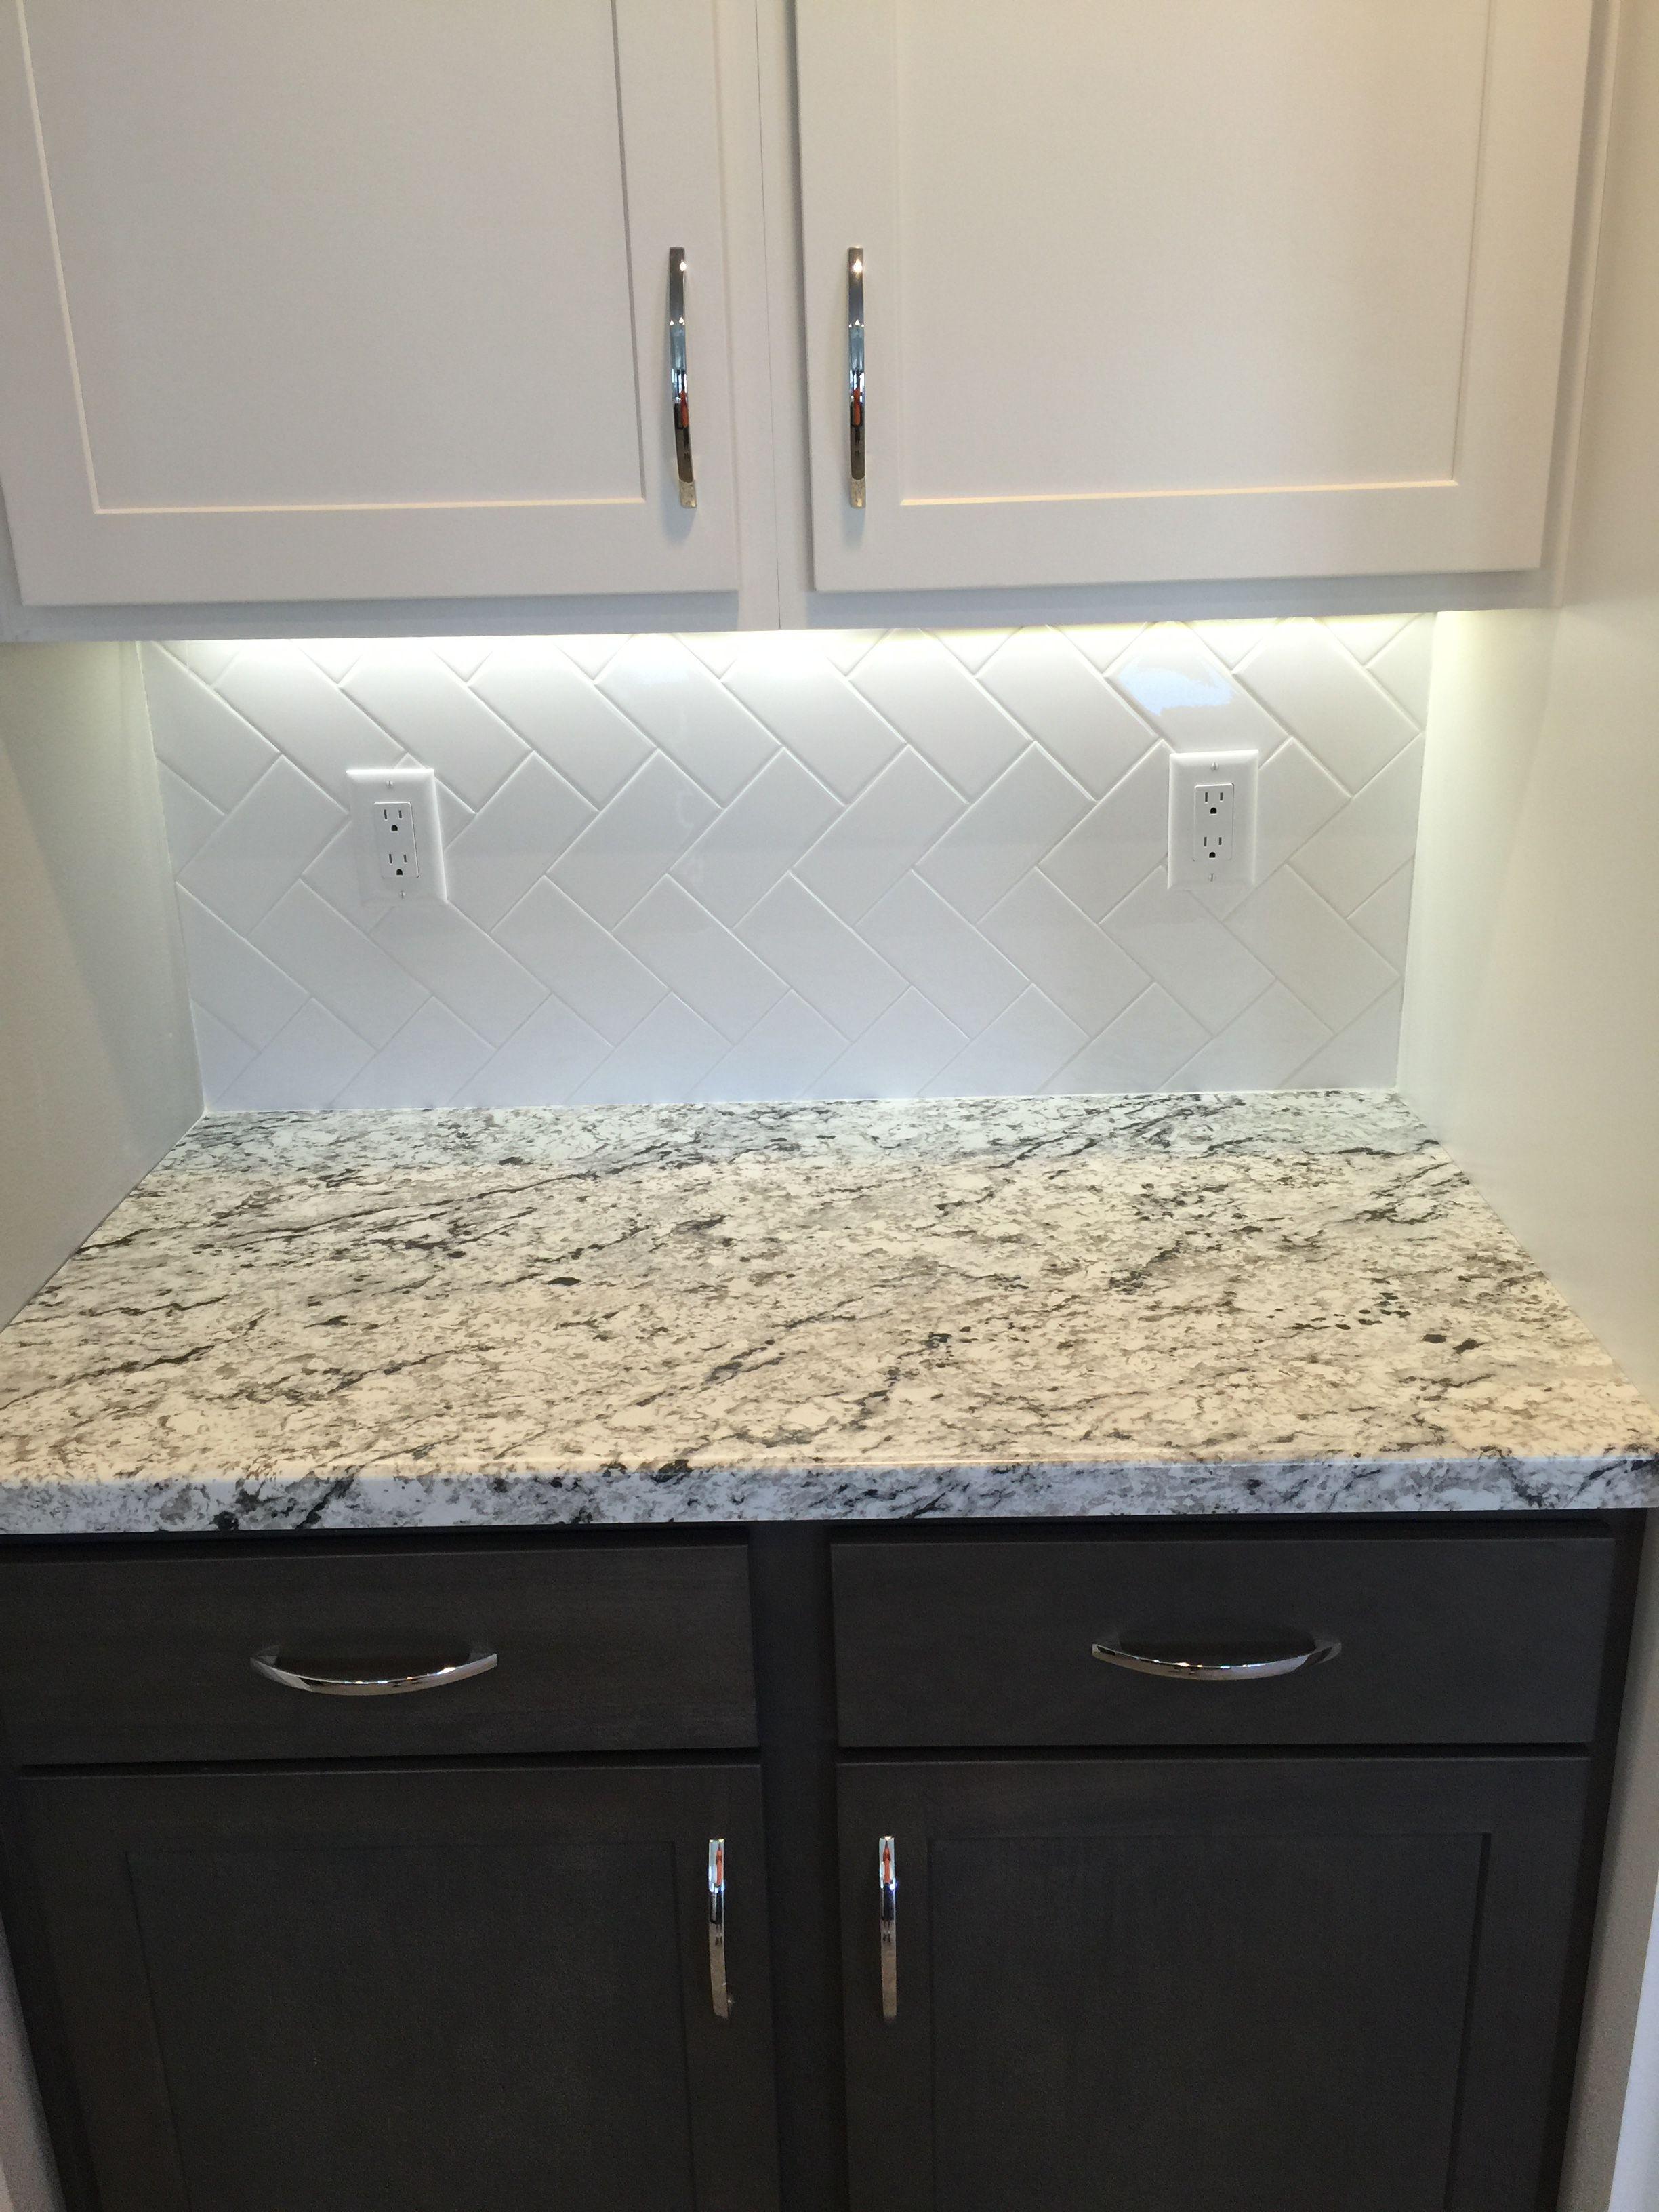 Kitchen backsplash in a white 3x6 subway tile in a vertical